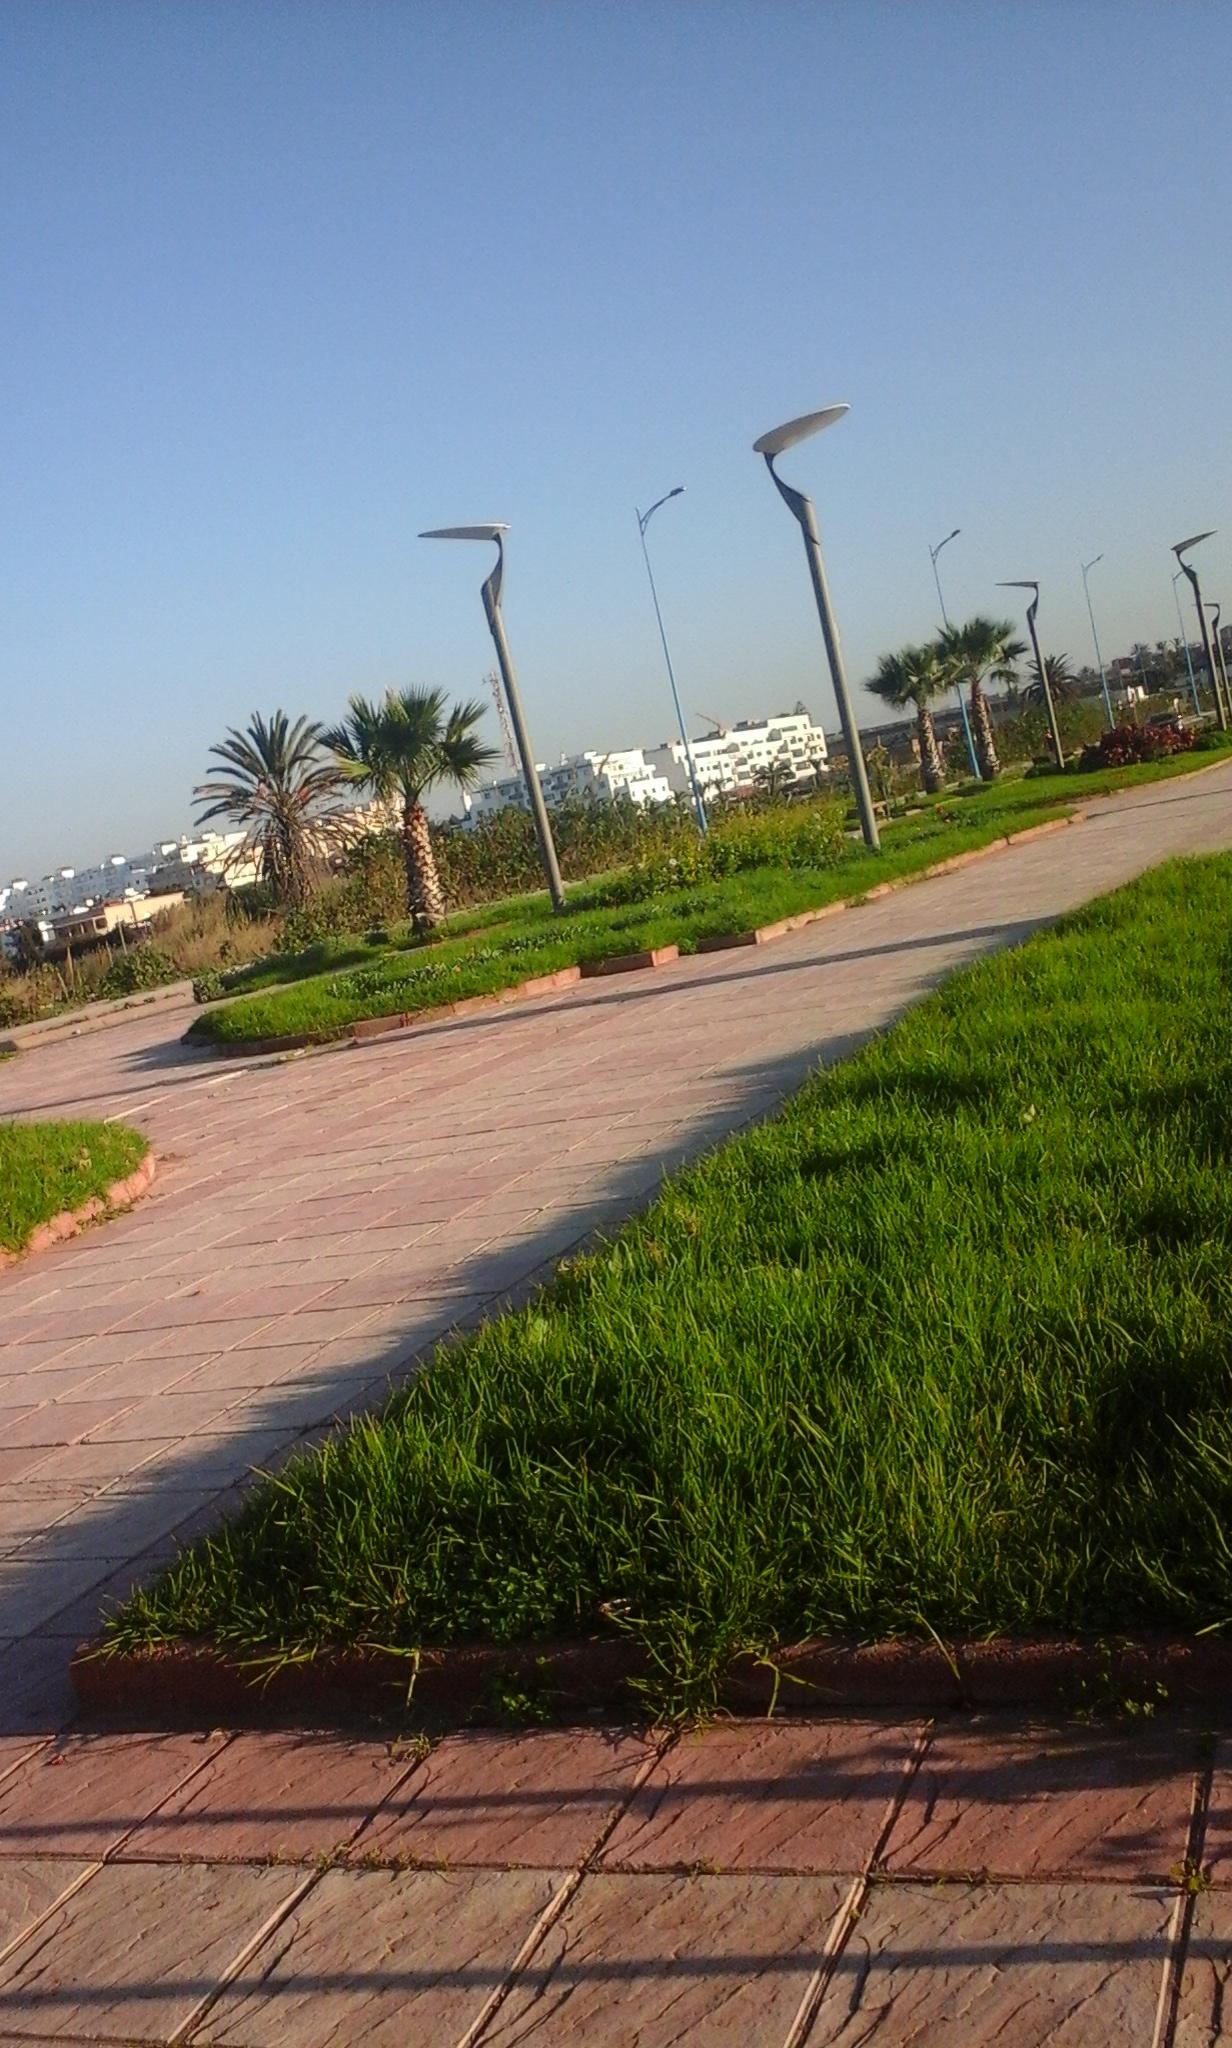 akhawat_islamway_1483036900___.jpg